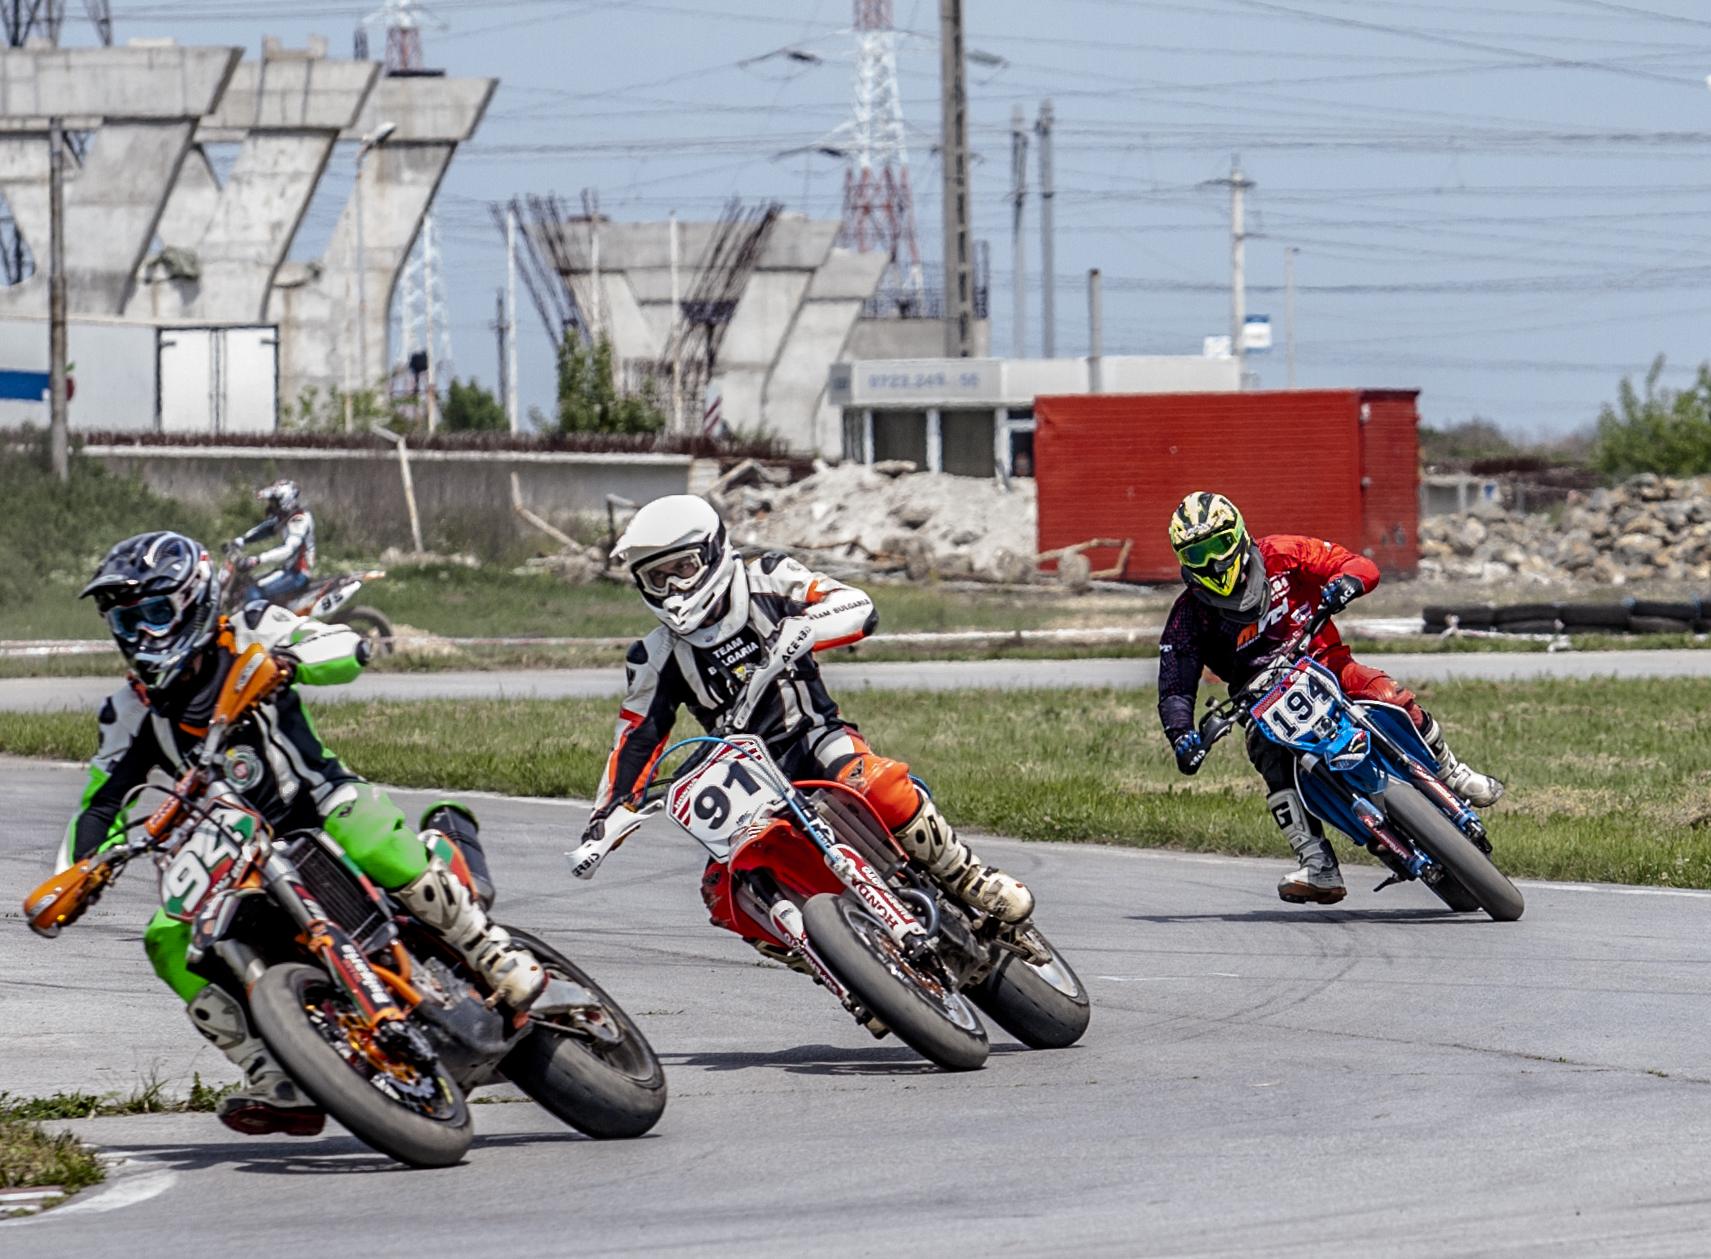 Supermoto – Campionat European la Arad